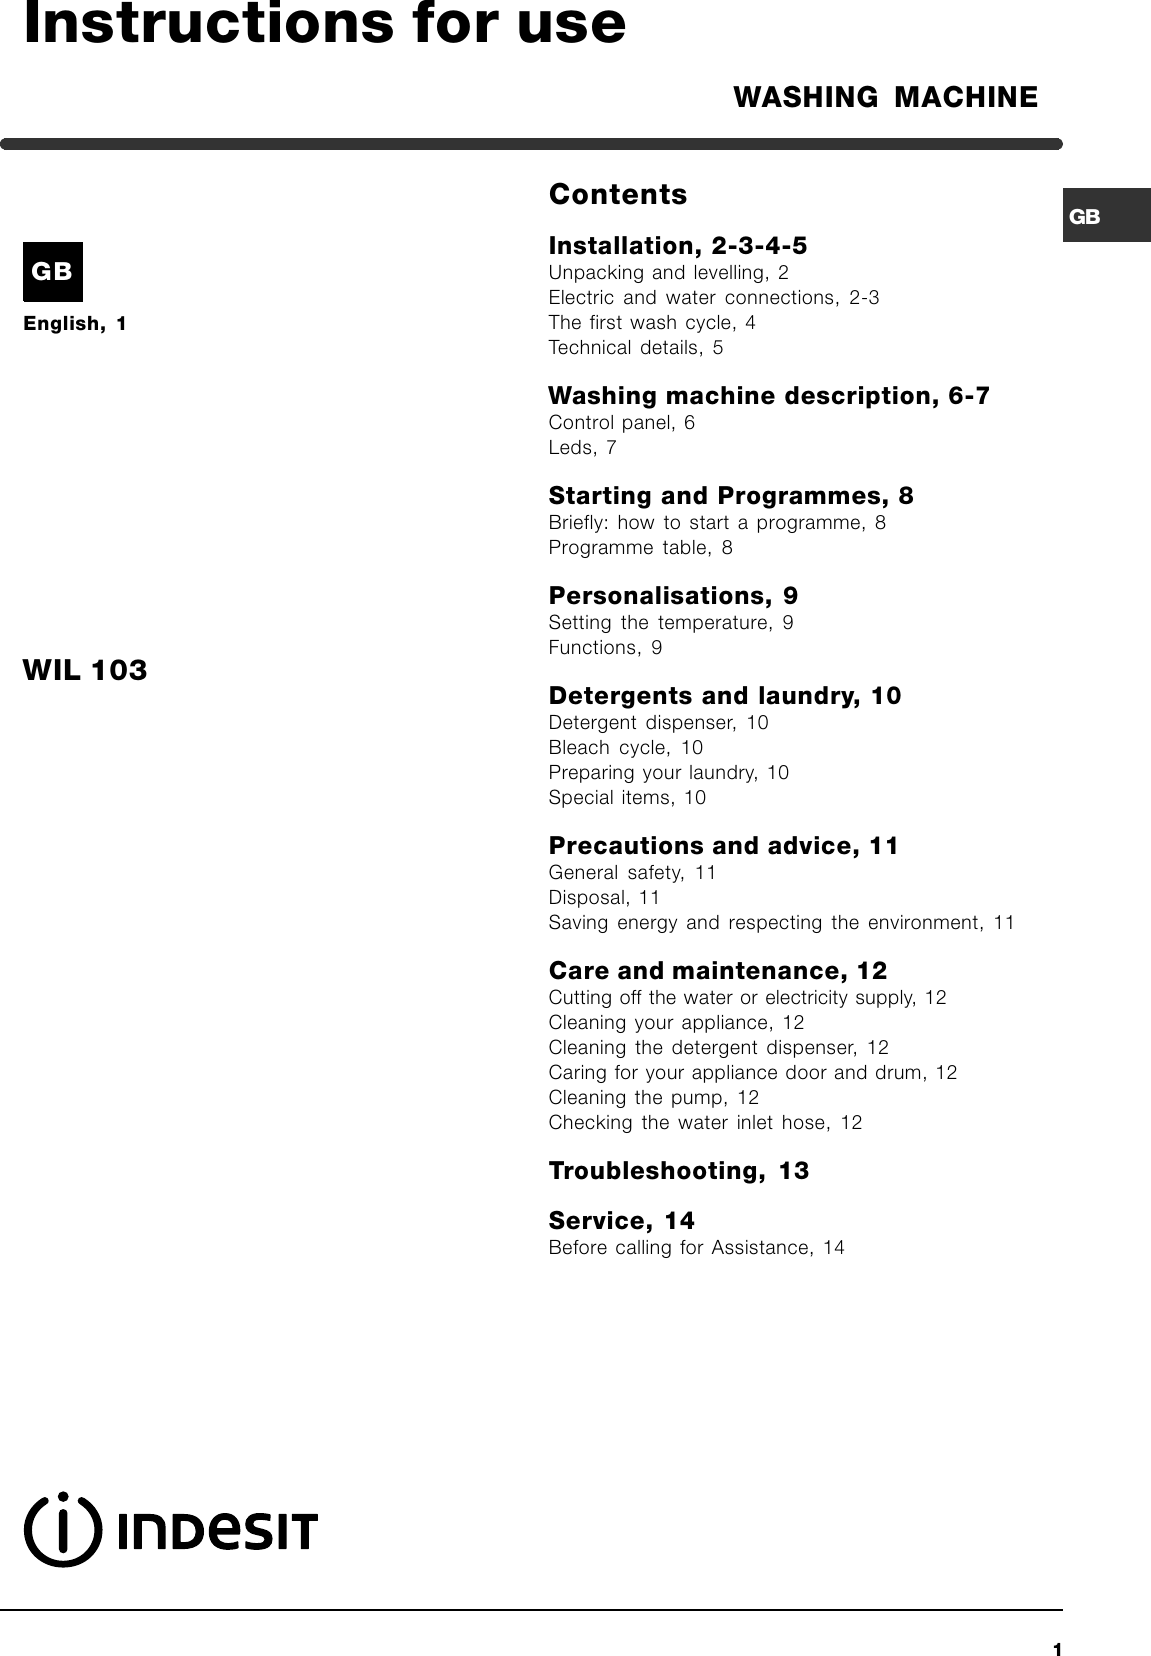 indesit washing machine wil103 instruction manual merloni rh usermanual wiki Wildgame Innovations Manuals Bissell PowerSteamer User Manual